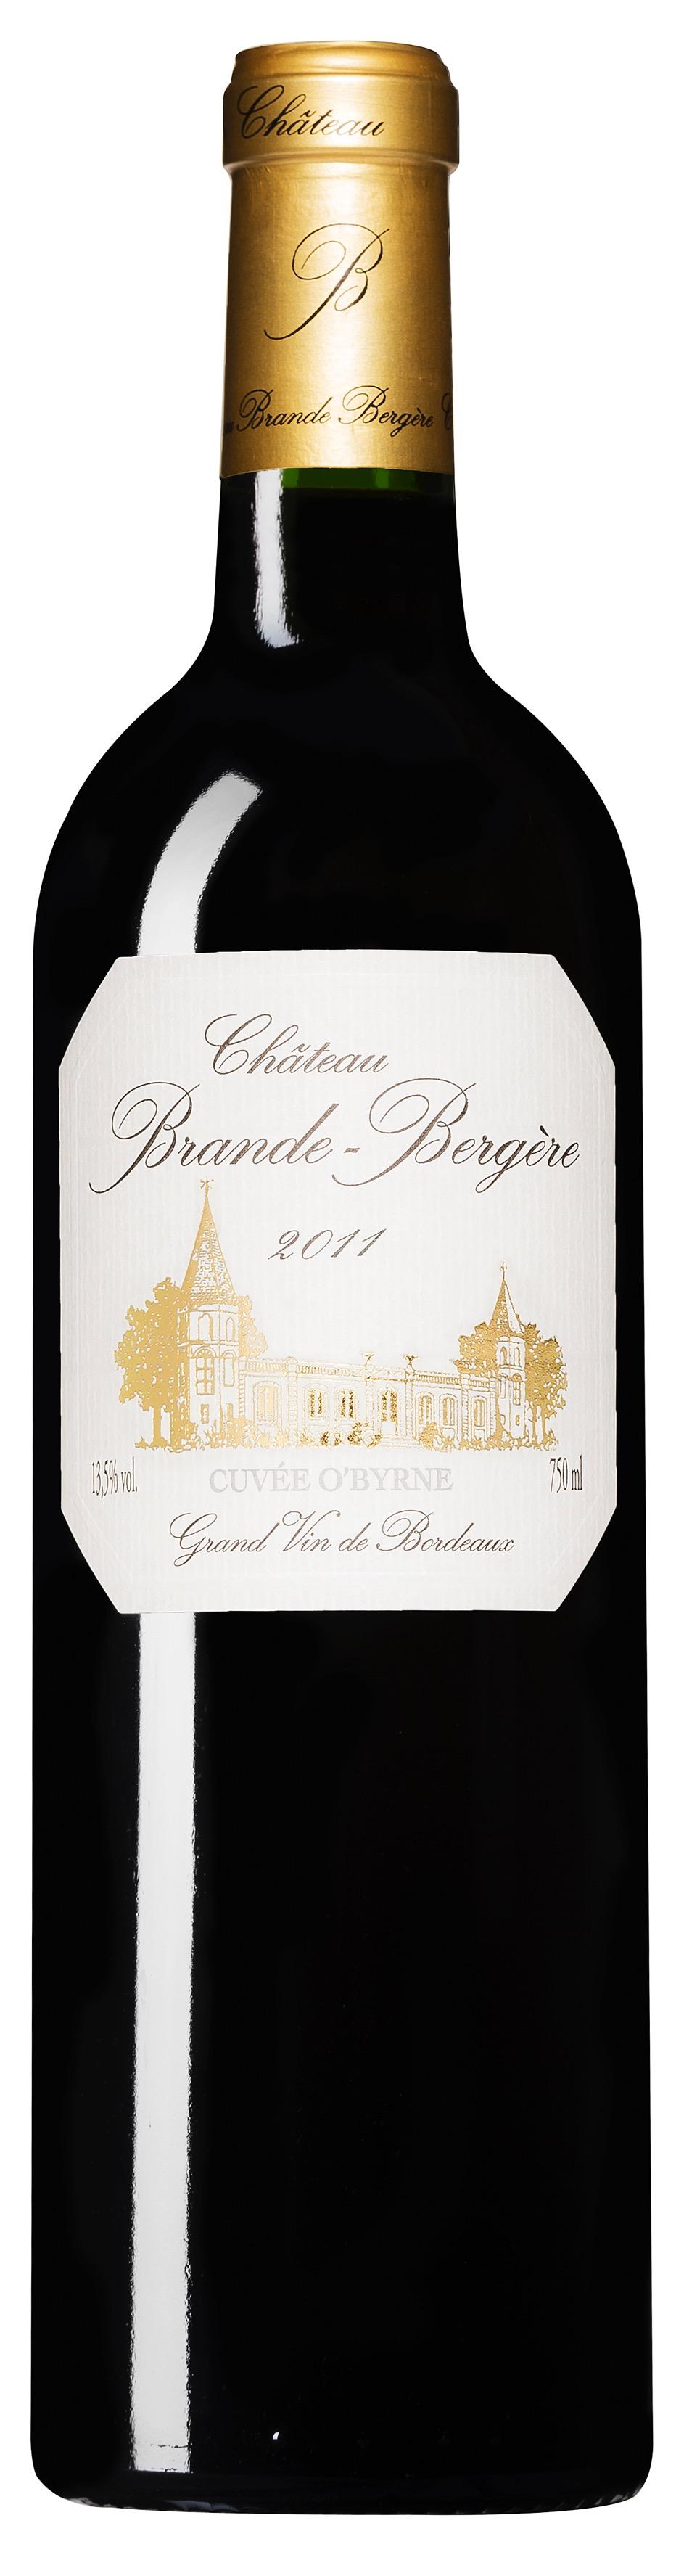 Chateau Brande-Bergere Cuvée O'Byrne 2011.jpg